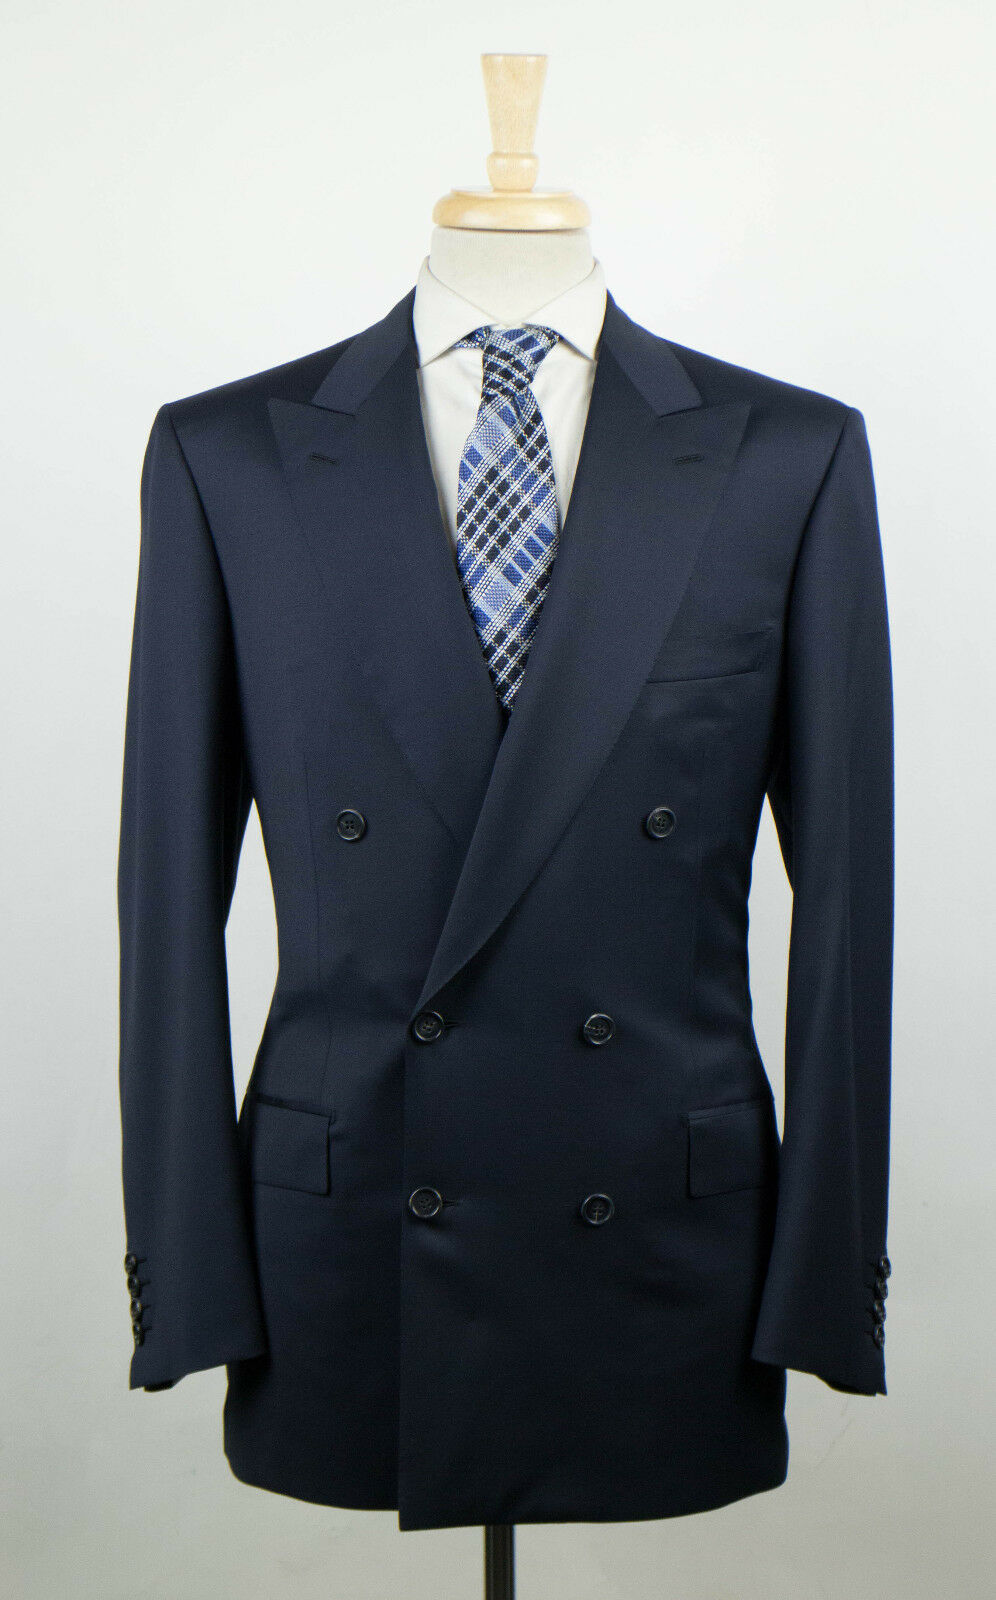 New. BRIONI Flaminio Blau Wool Double Breasted Sport Coat Größe 50/40 R 3995